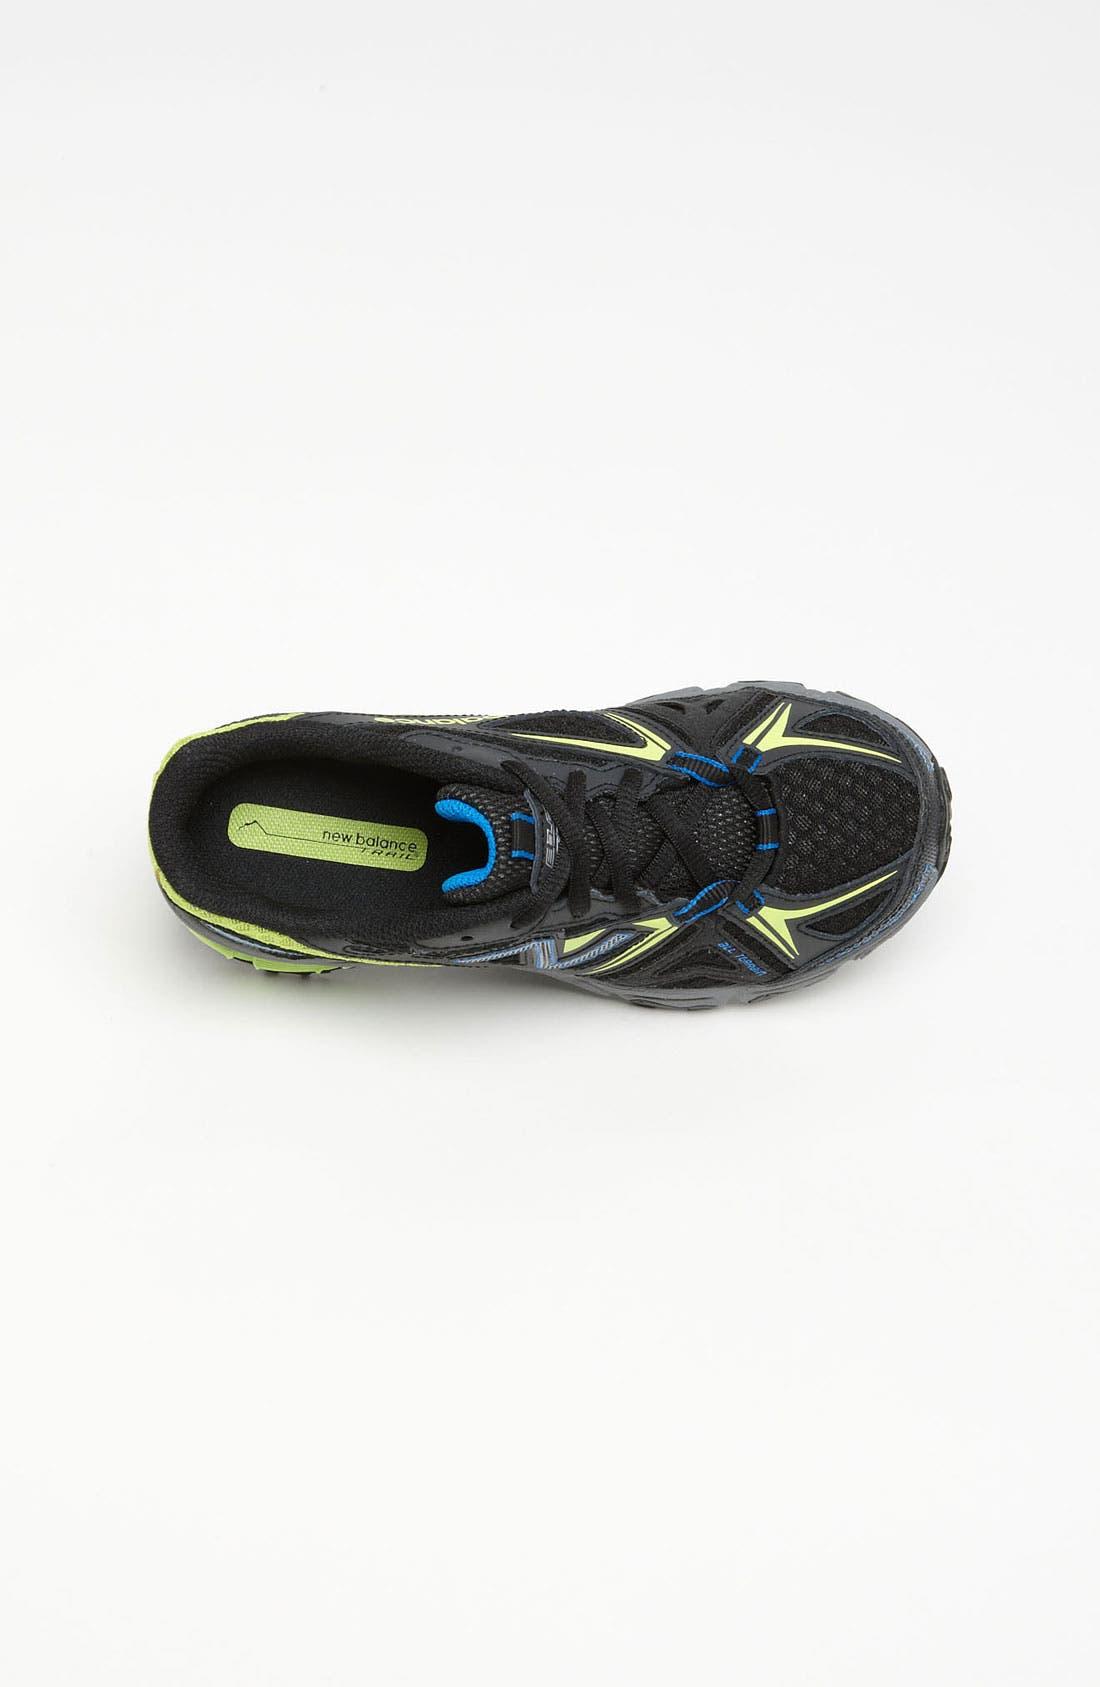 Alternate Image 3  - New Balance 'Takedown 610' Trail Running Shoe (Toddler, Little Kid & Big Kid)